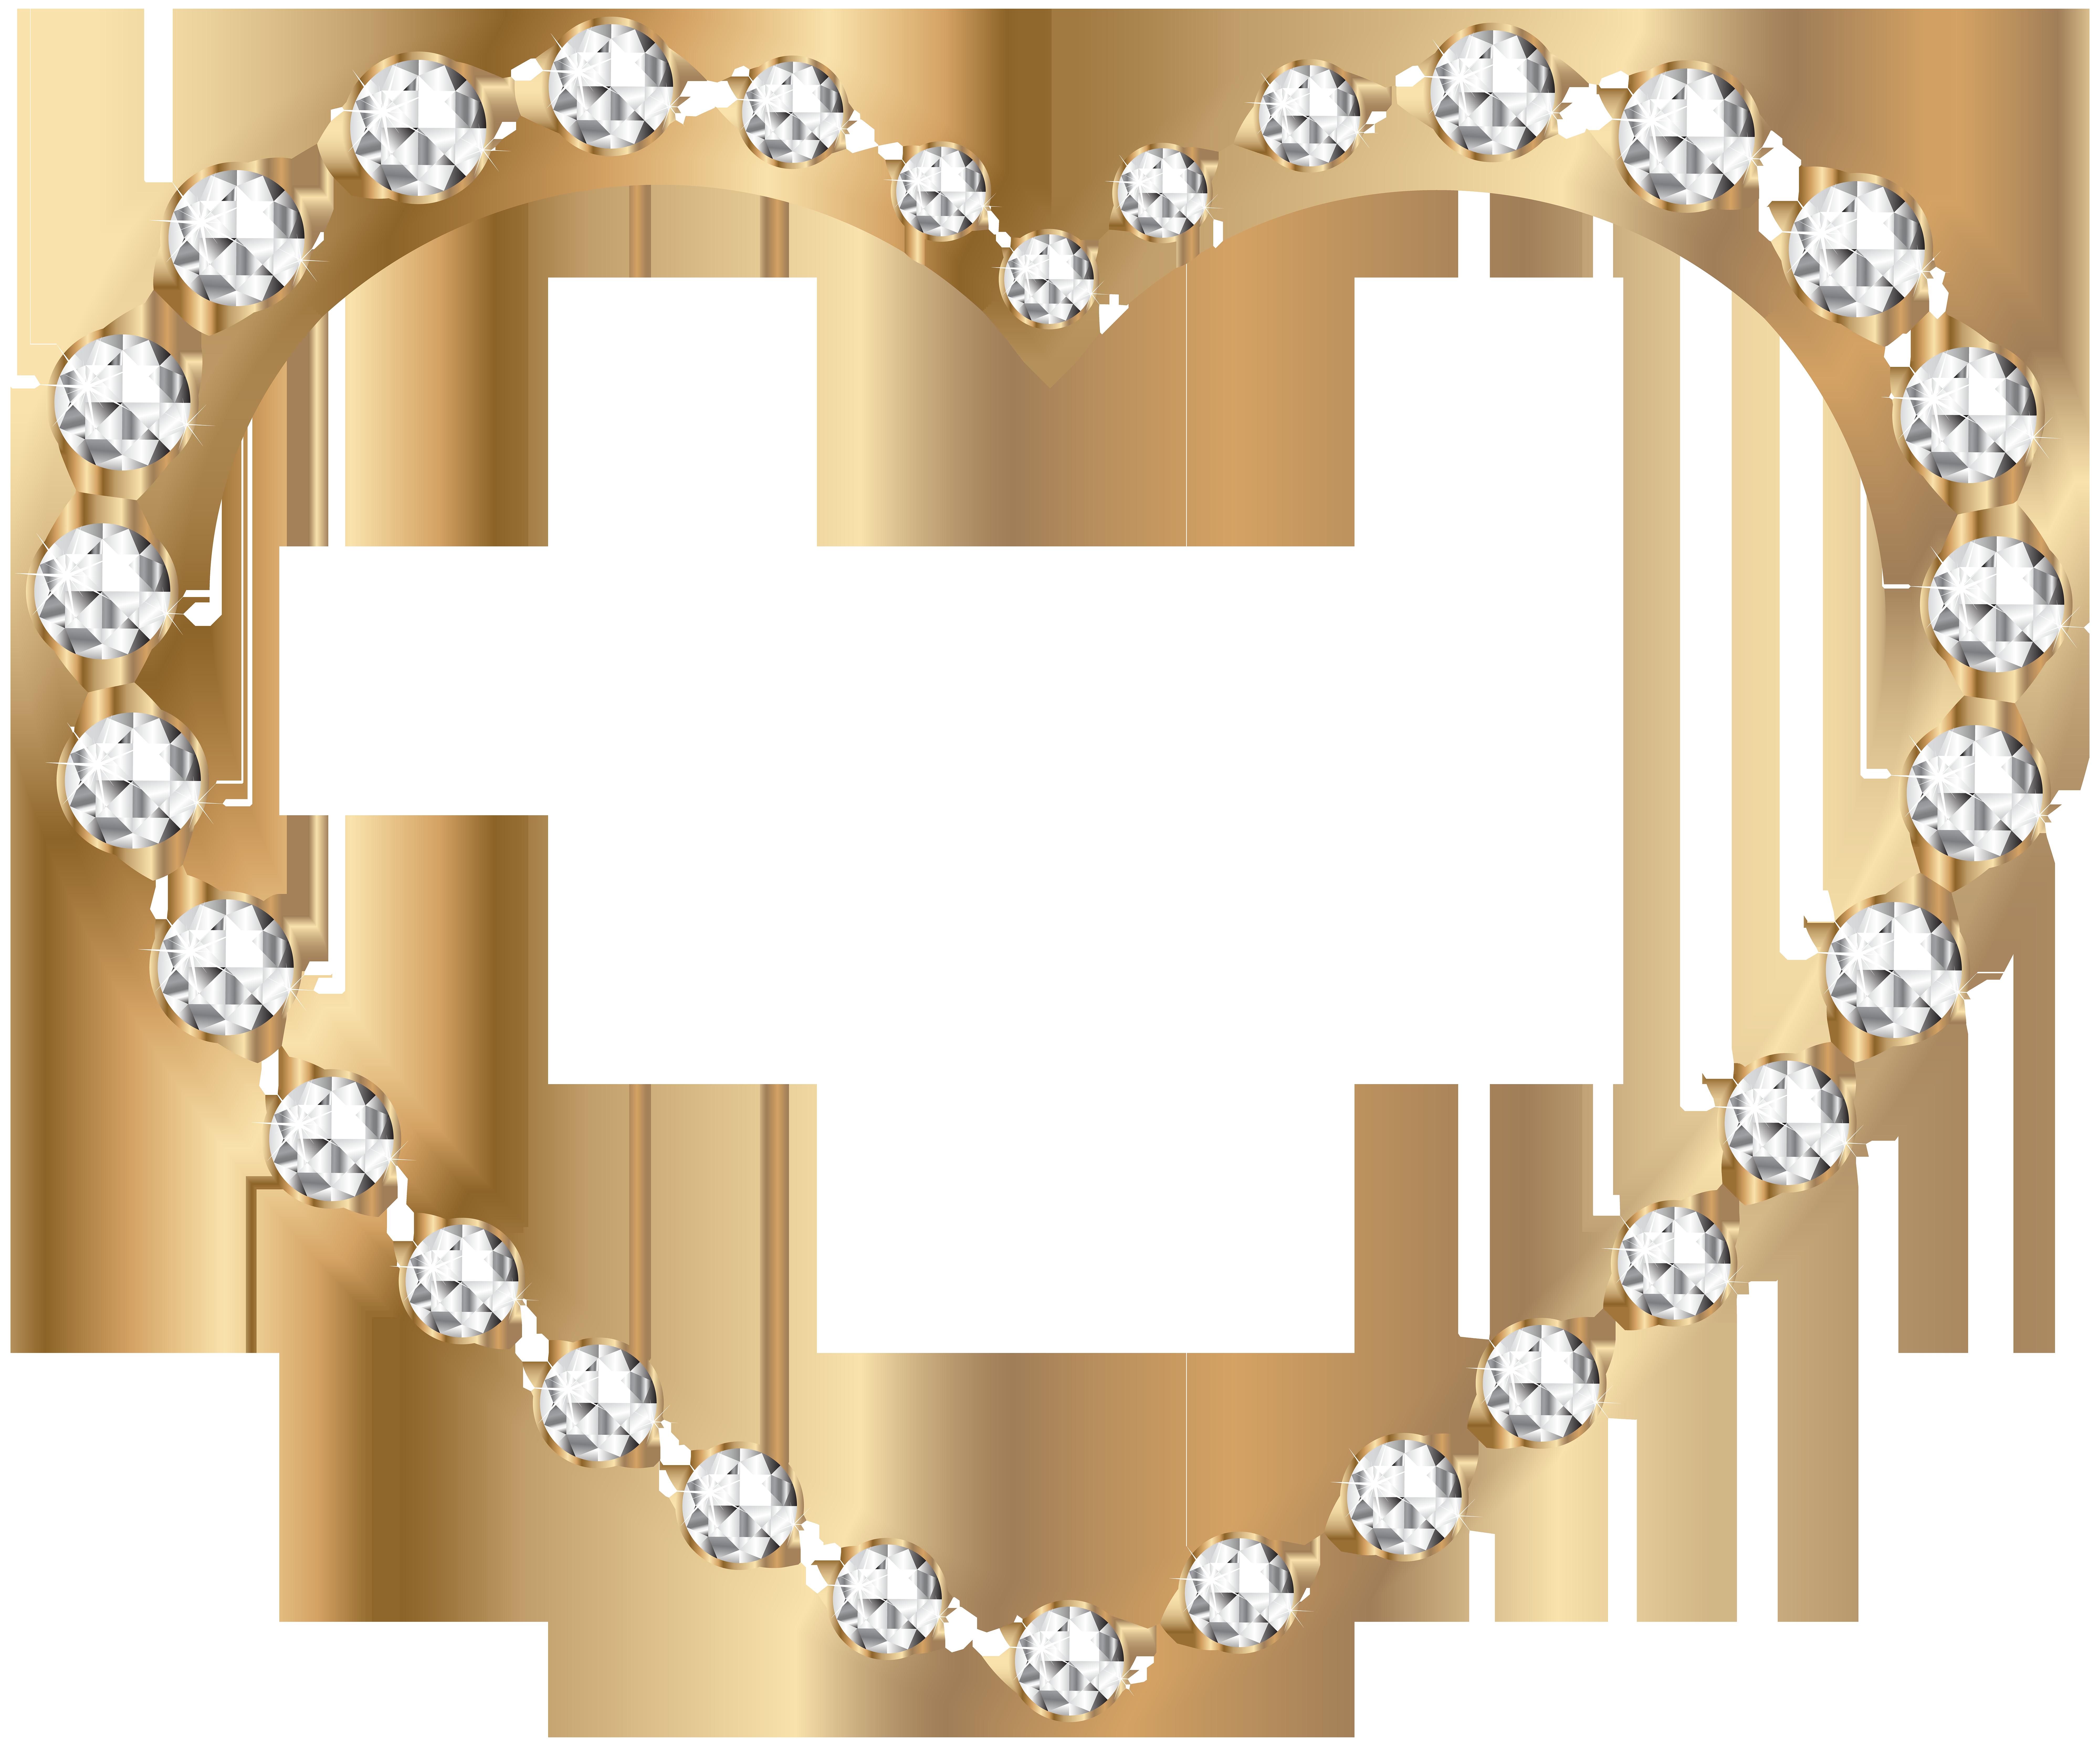 Gold heart outline clipart clip art transparent download Gold Heart with Diamonds Transparent PNG Image | Gallery ... clip art transparent download